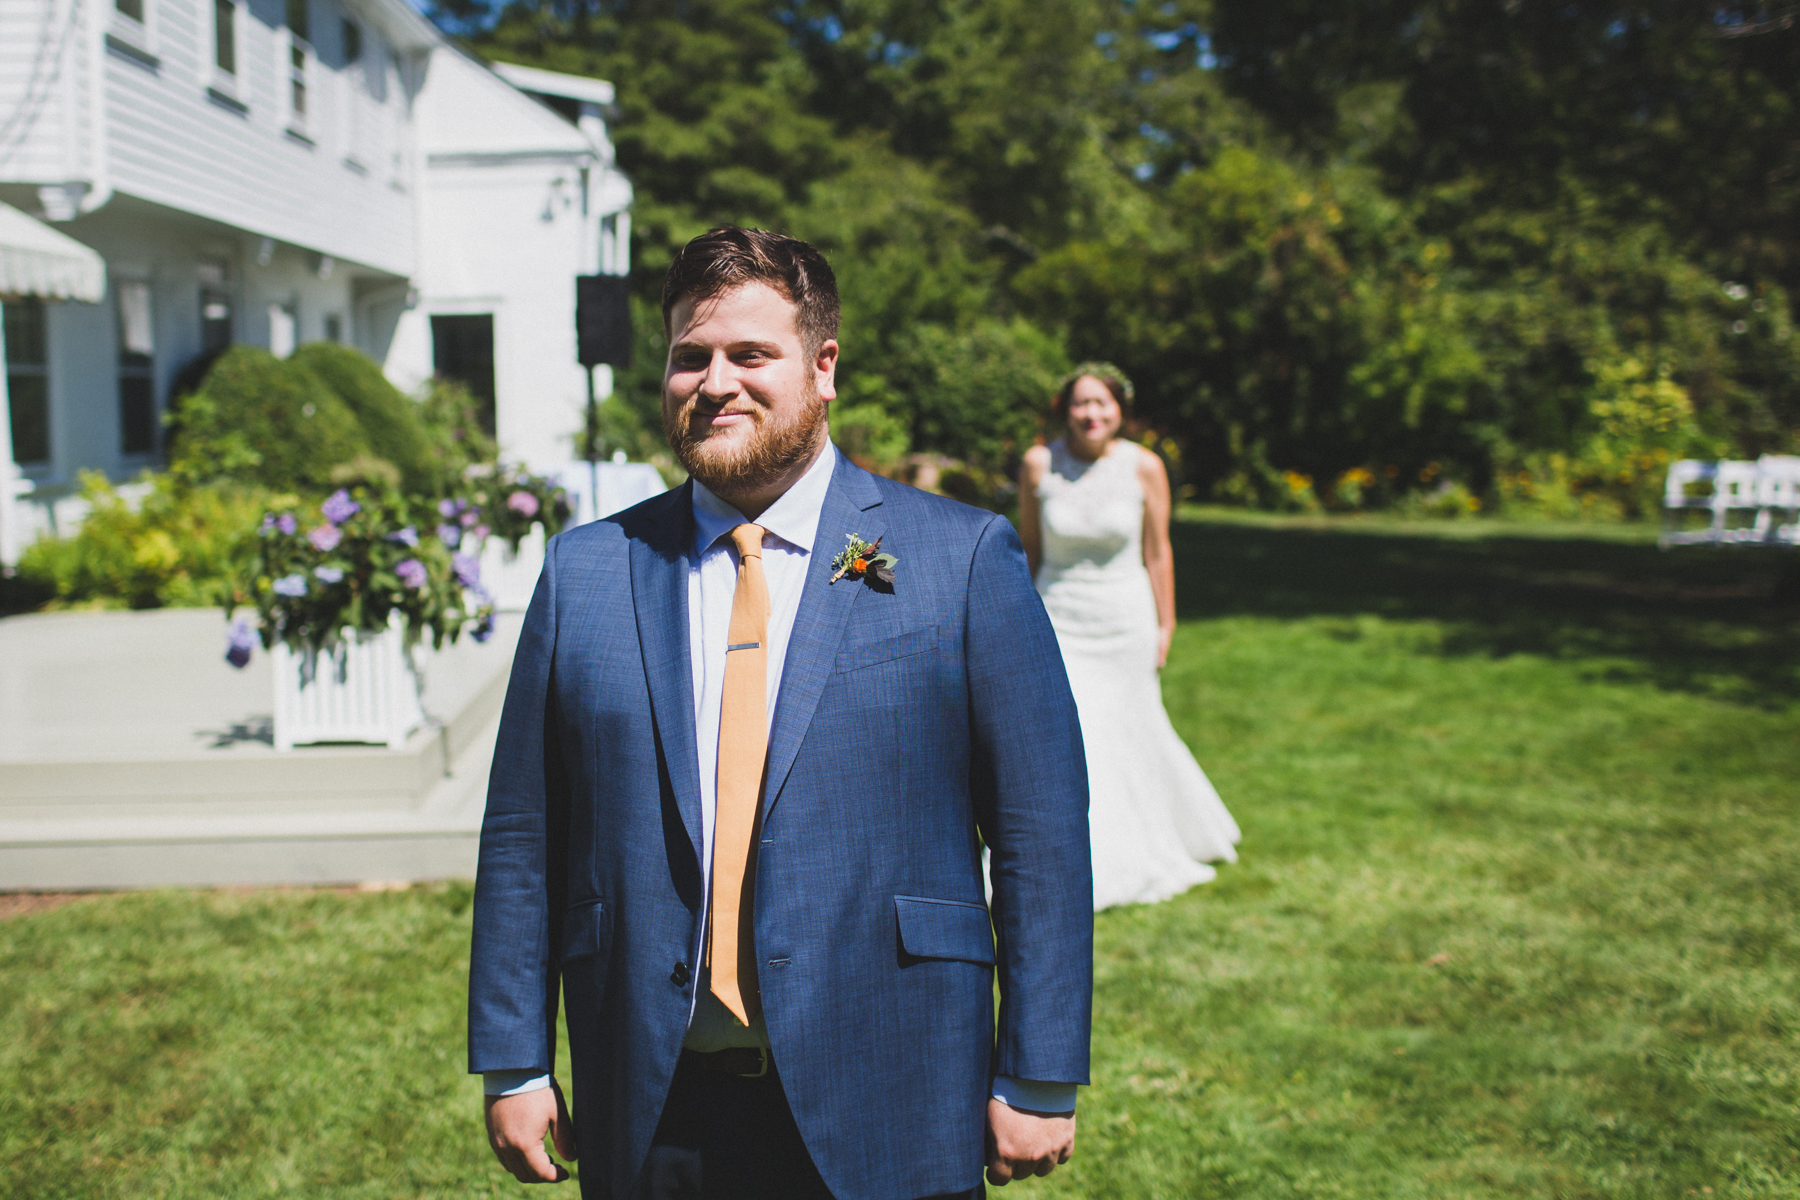 Long-Island-Documentary-Wedding-Photography-Summer-Tent-Wedding-in-New-York-18.jpg